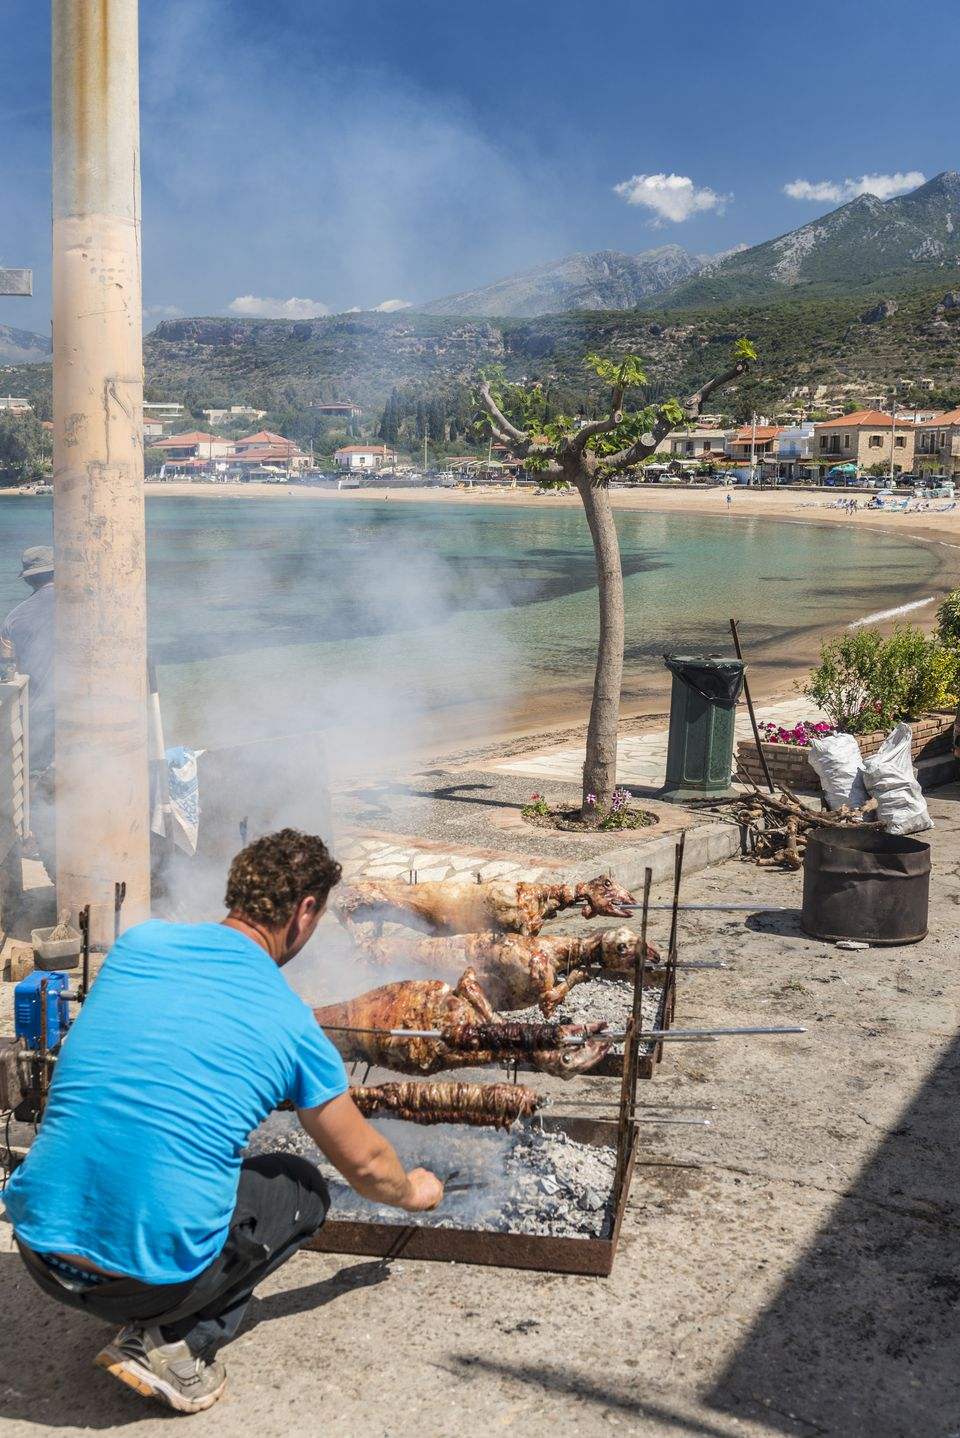 Easter Lamb Roast, Beach of Stoupa Greece